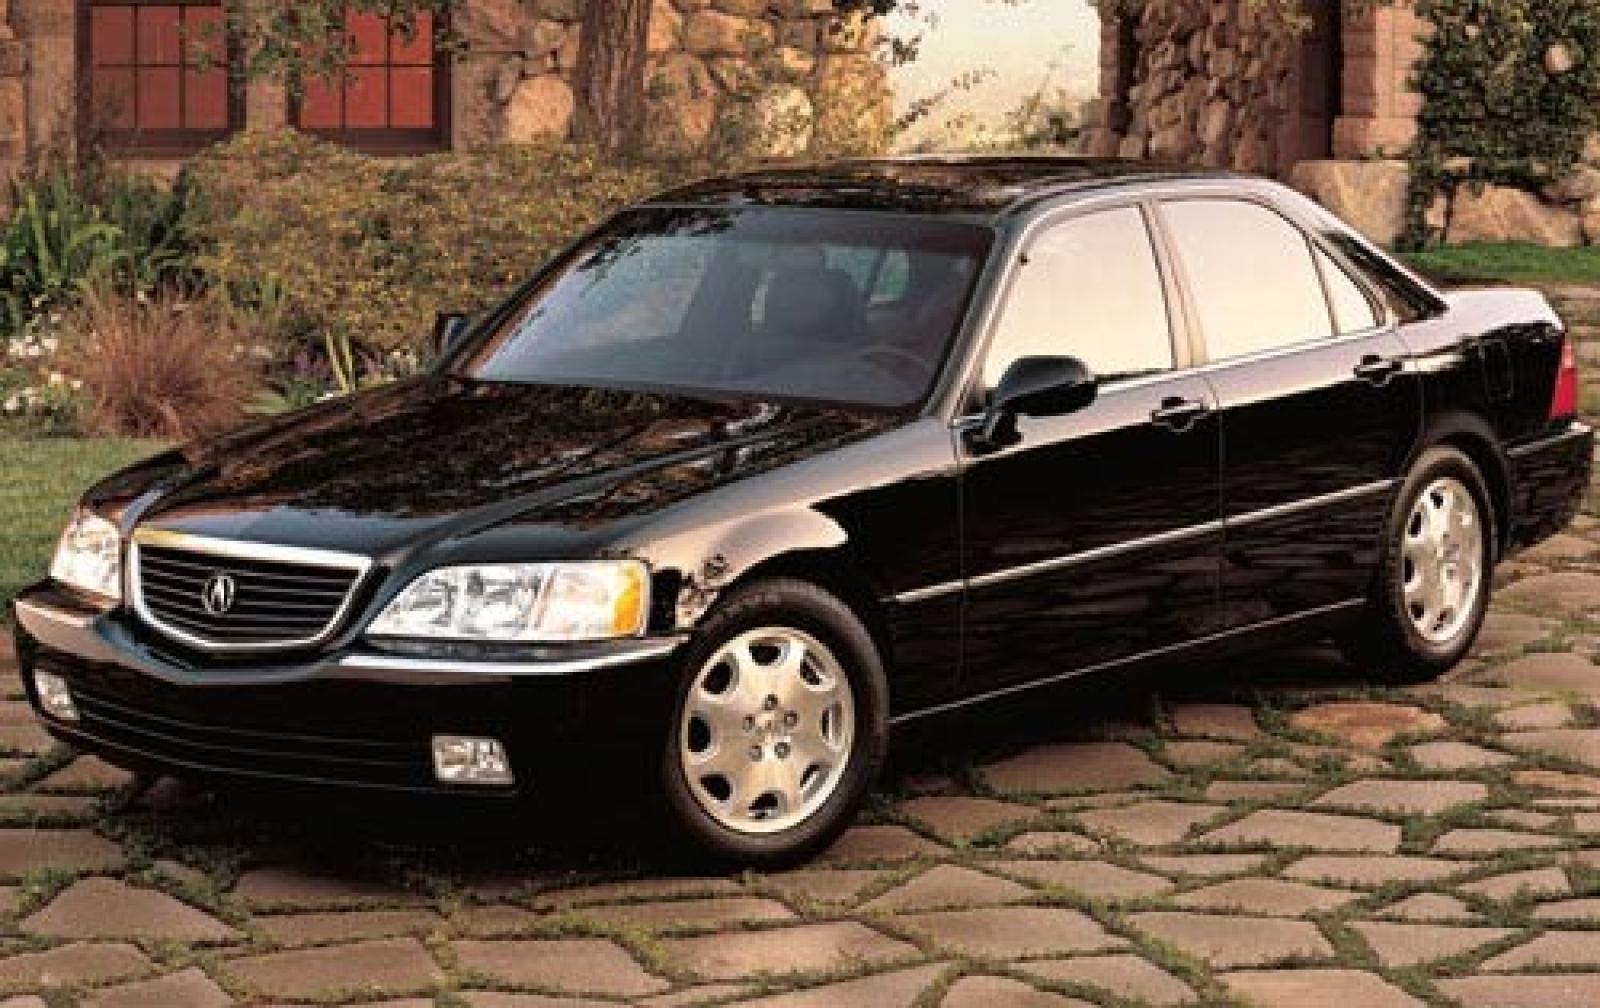 2000 Acura RL #1